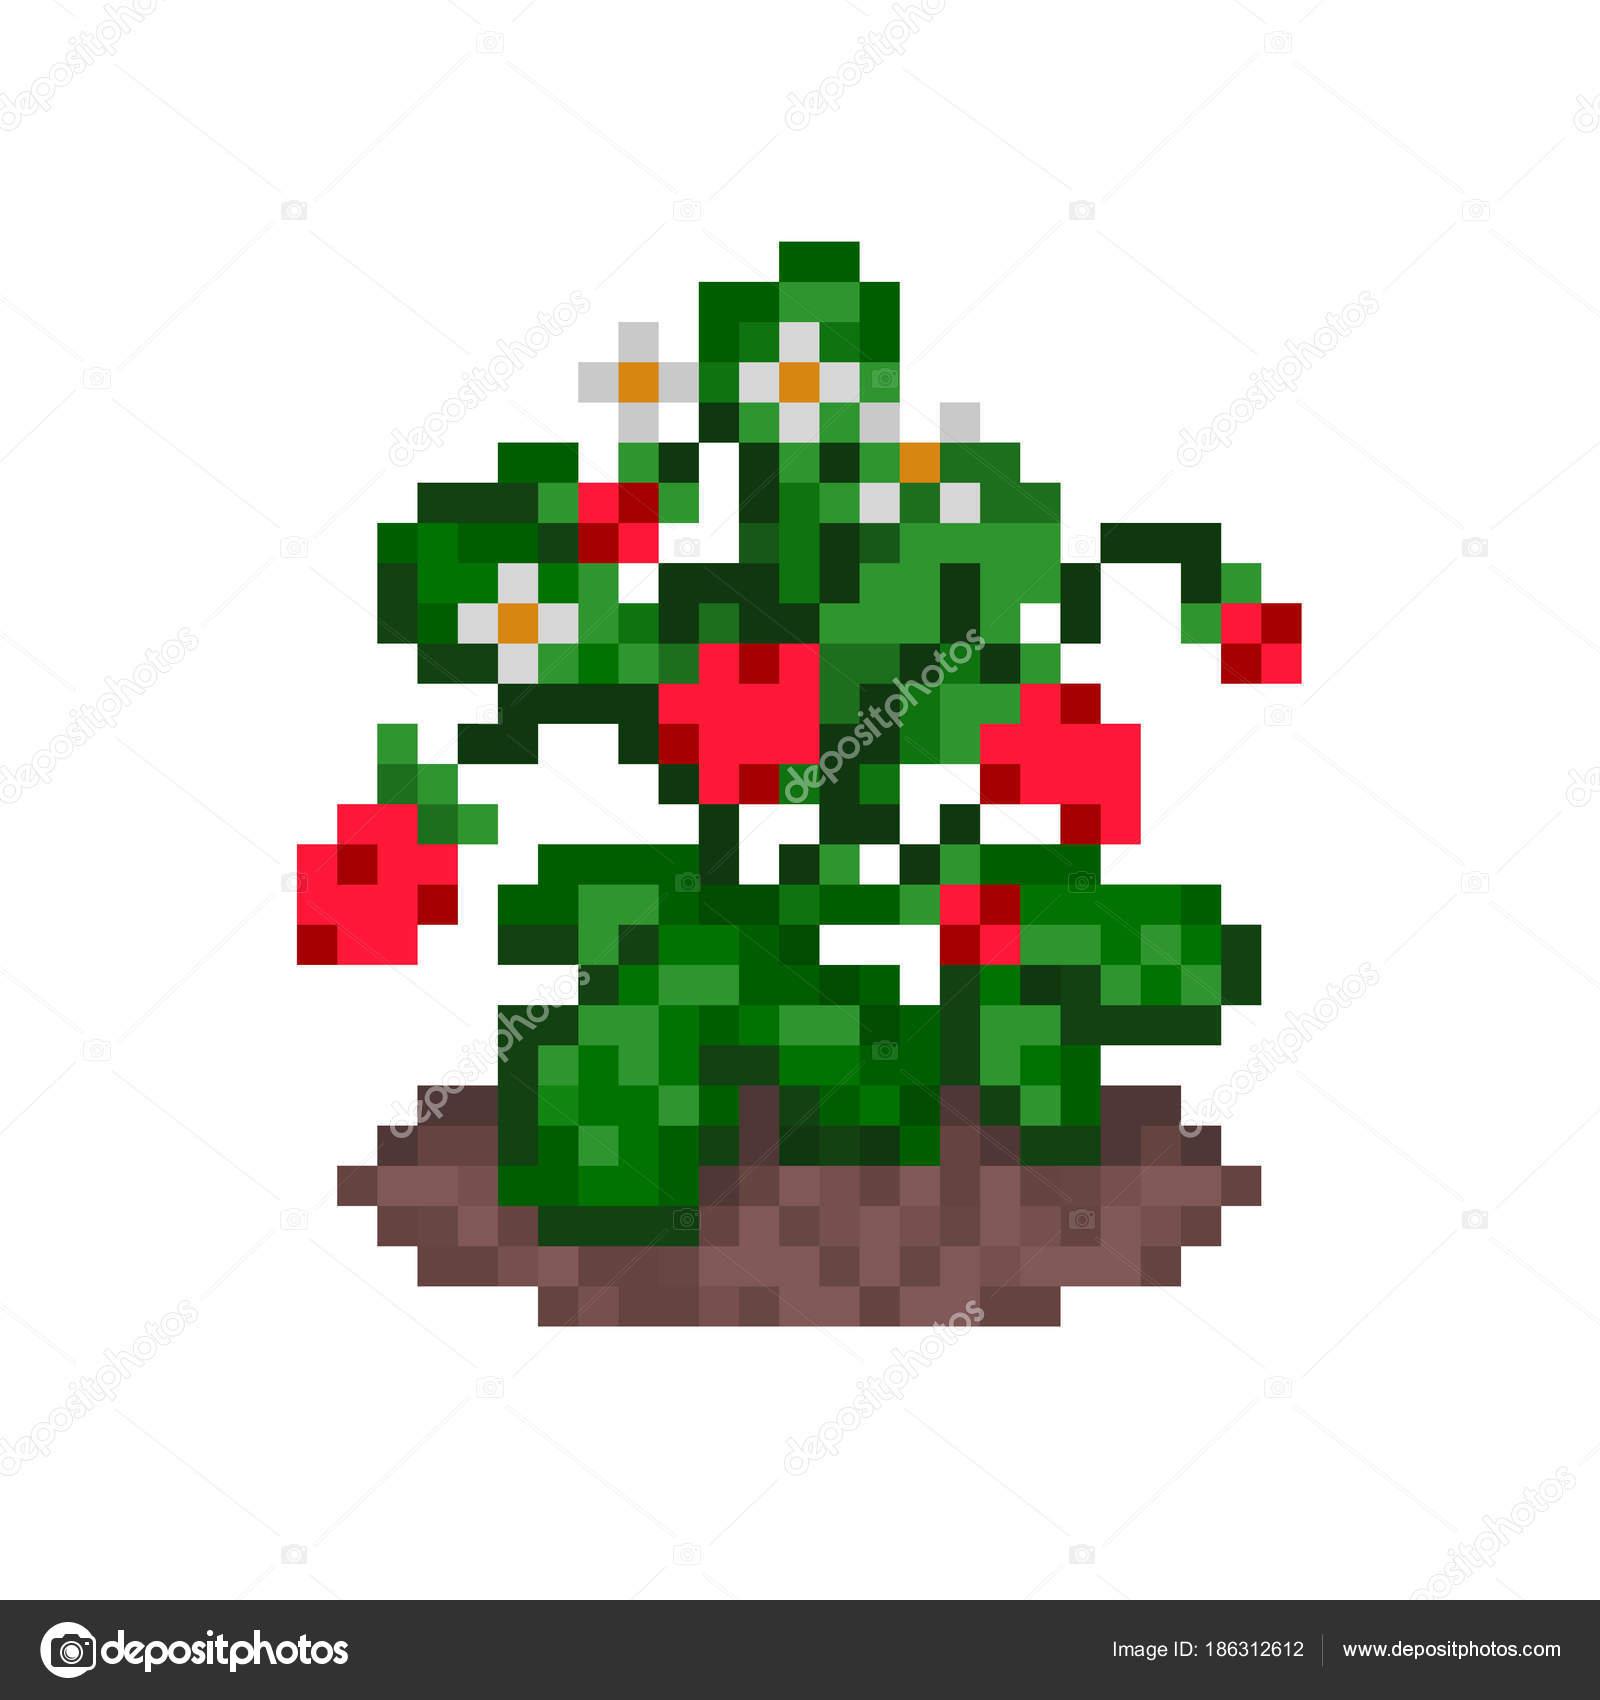 Wild Strawberries On A Bush Growing In A Bed, Pixel Art Icon à Pixel Art Fraise